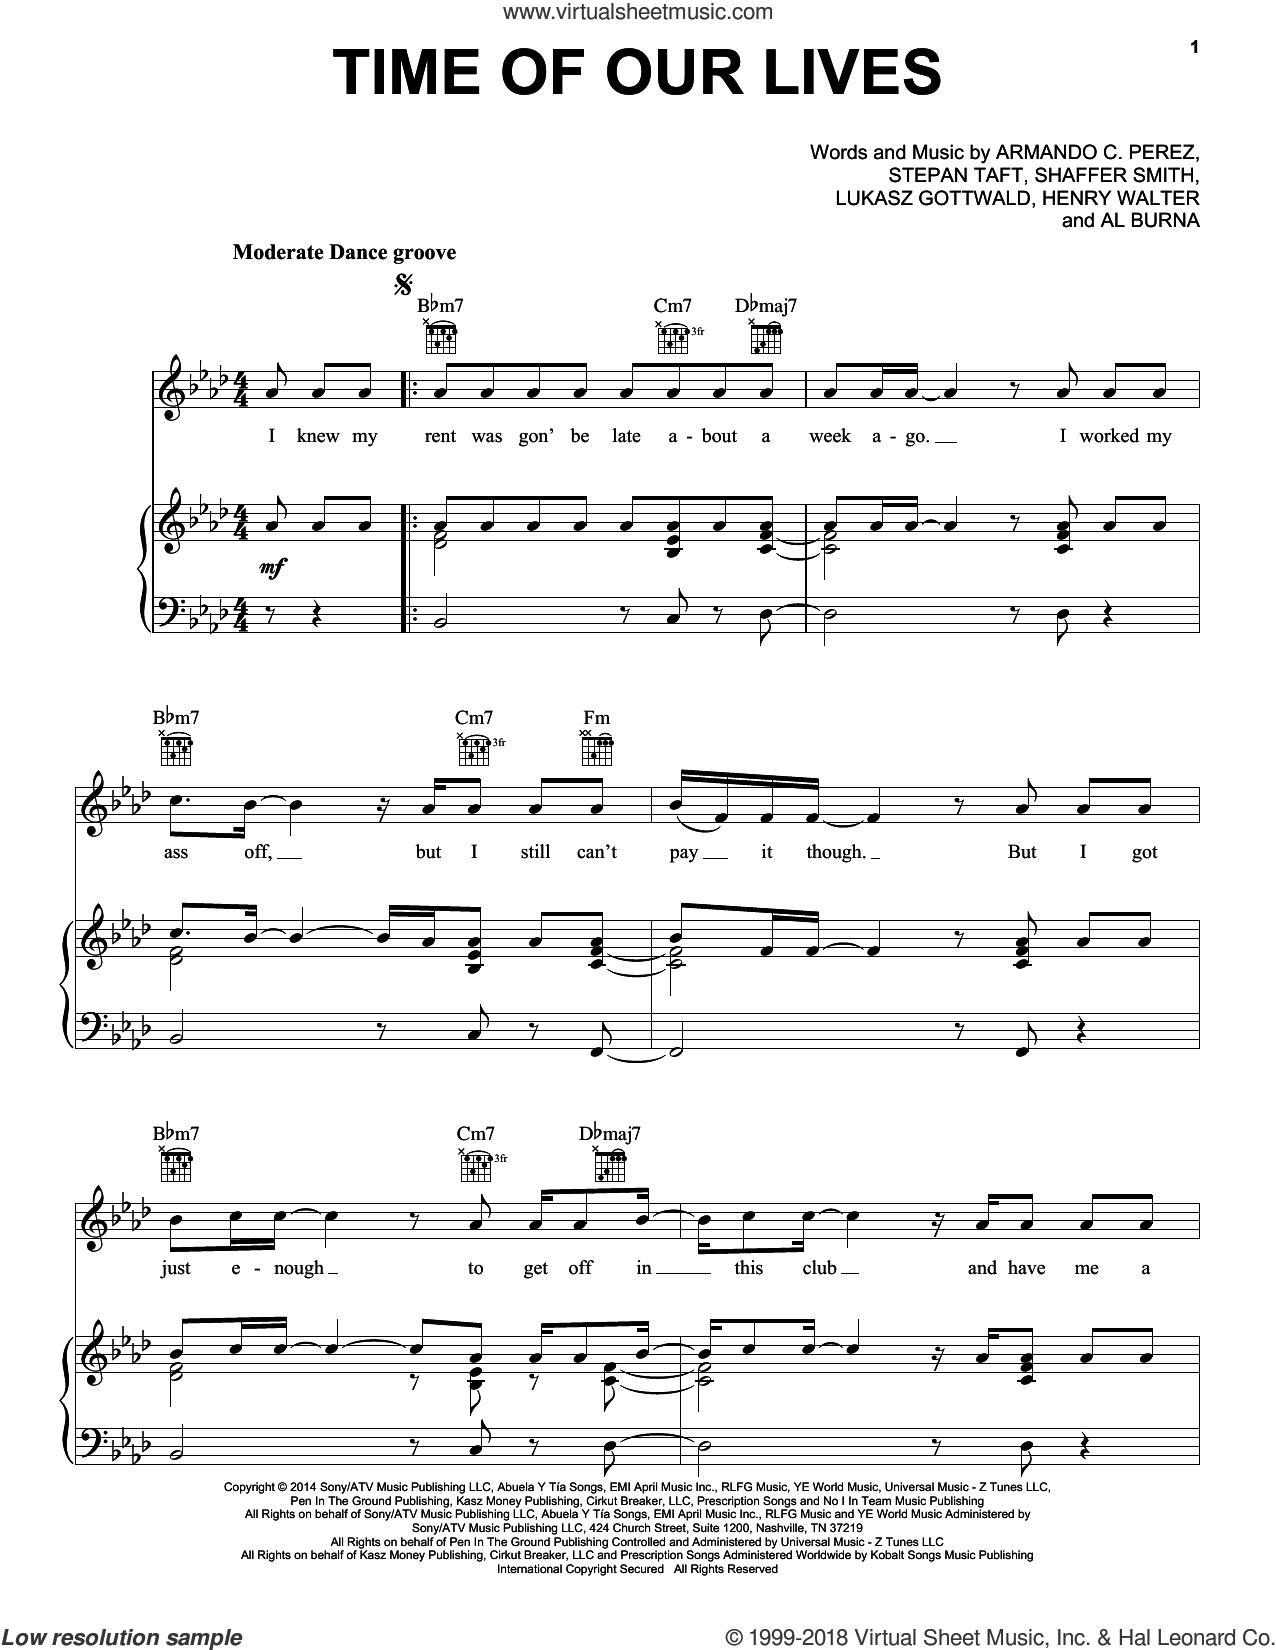 Time Of Our Lives sheet music for voice, piano or guitar by Pitbull & Ne-Yo, Ne-Yo, Pitbull, Al Burna, Armando C. Perez, Henry Walter, Lukasz Gottwald, Shaffer Smith and Stepan Taft, intermediate skill level